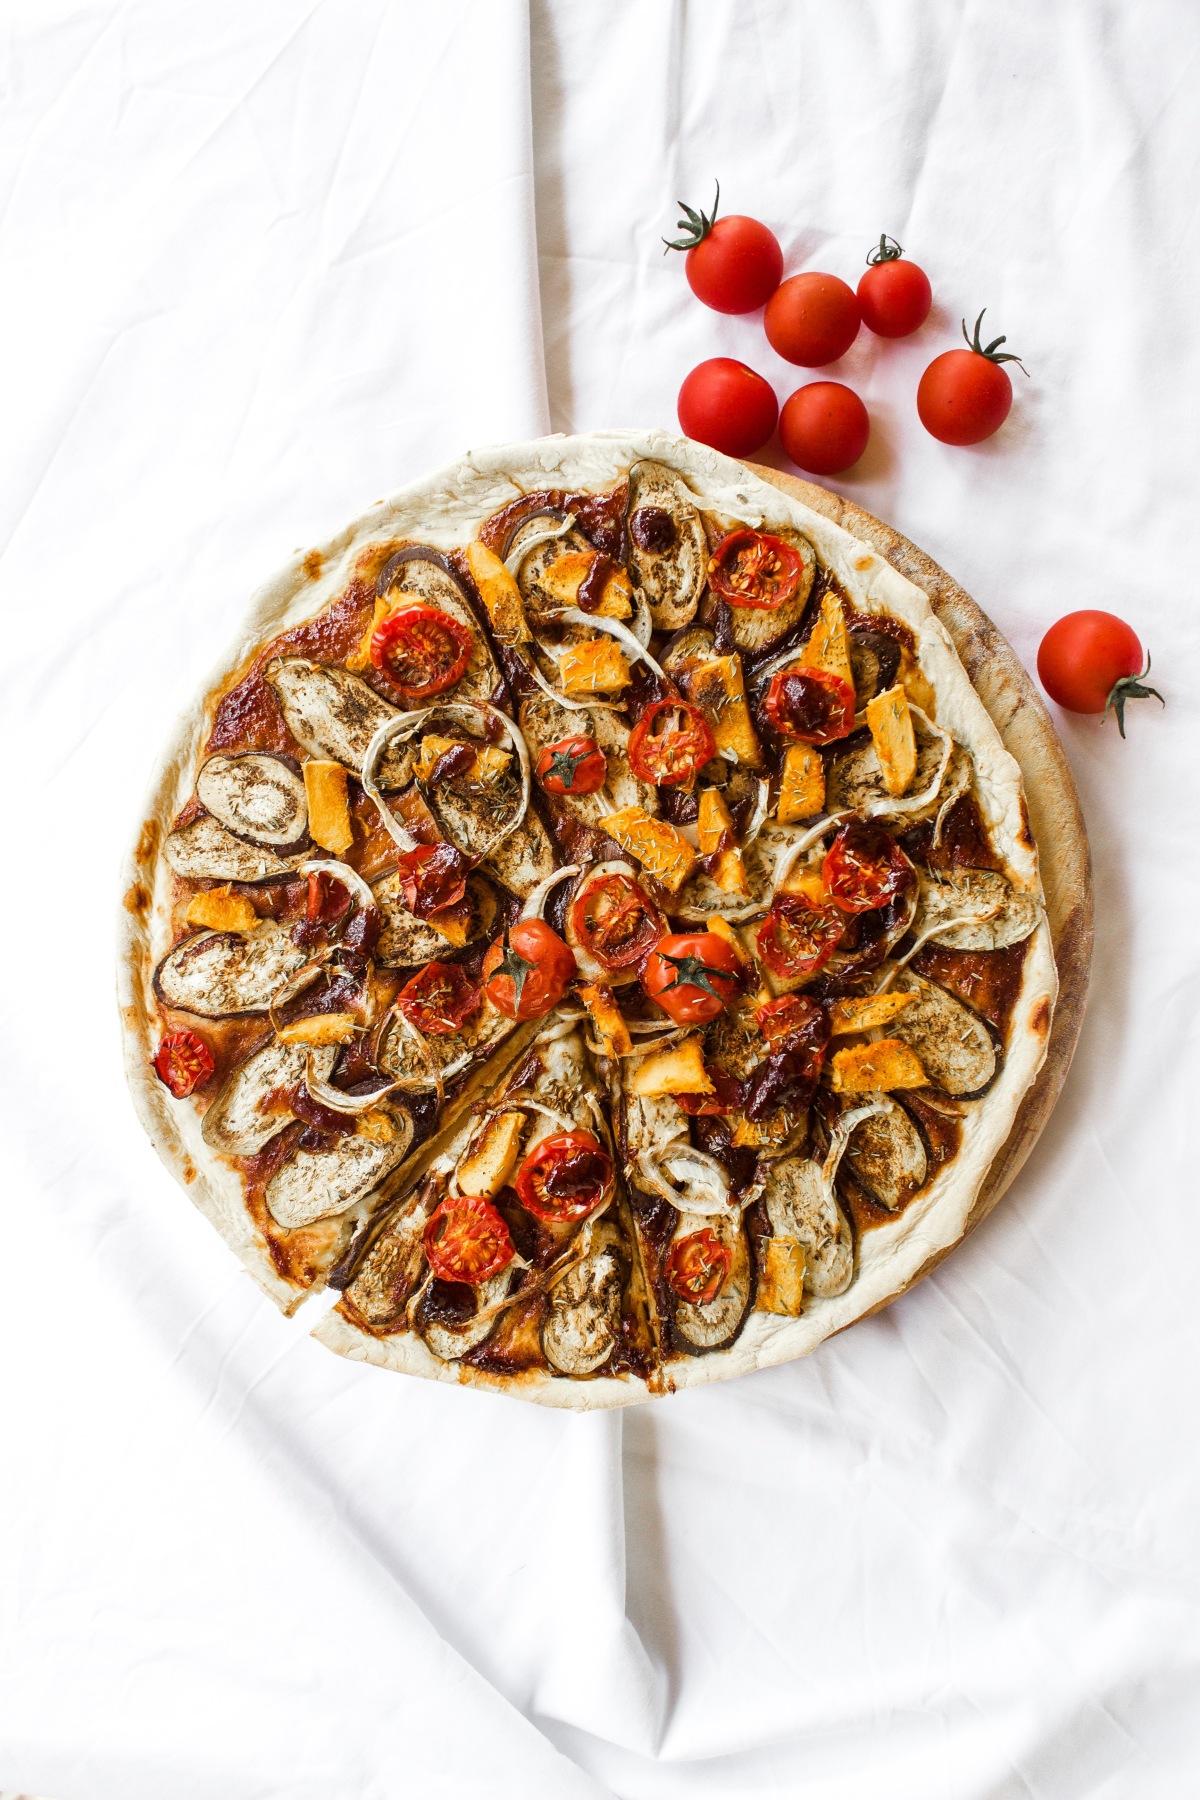 BBQ Vegan Pizza